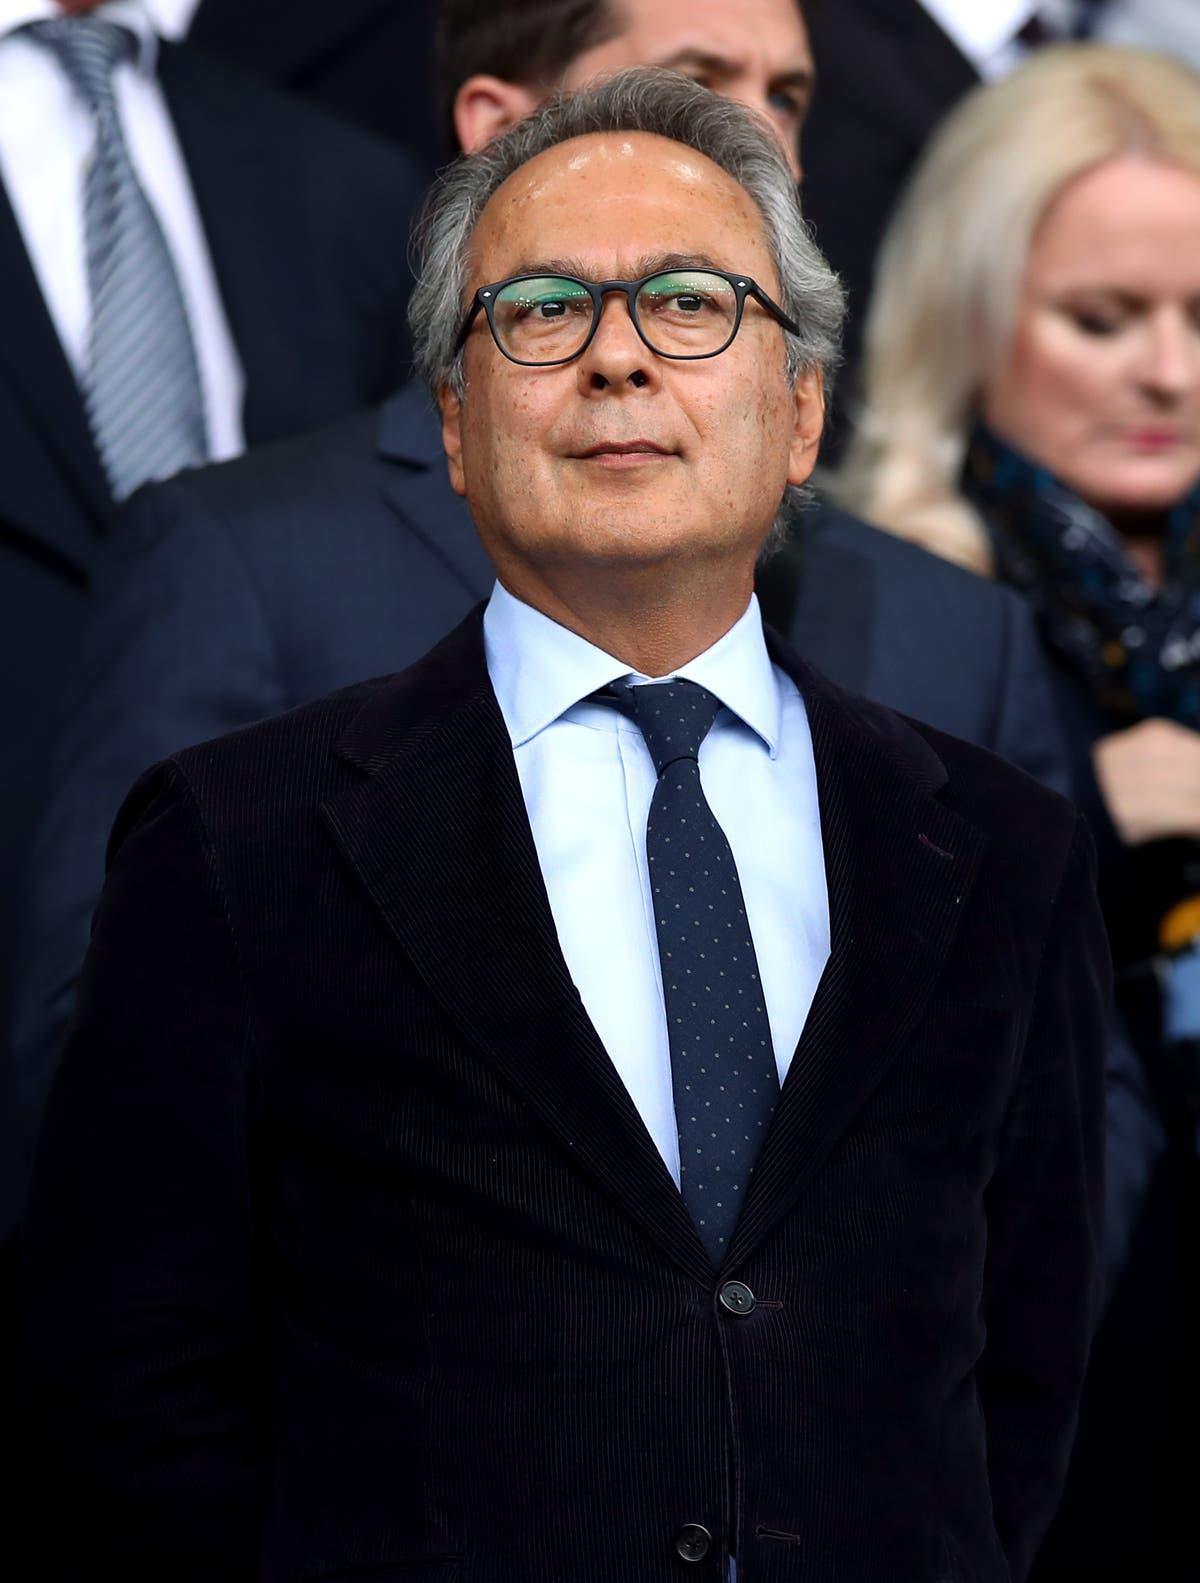 Farhad Moshiri confident Rafael Benitez will bring success to Everton